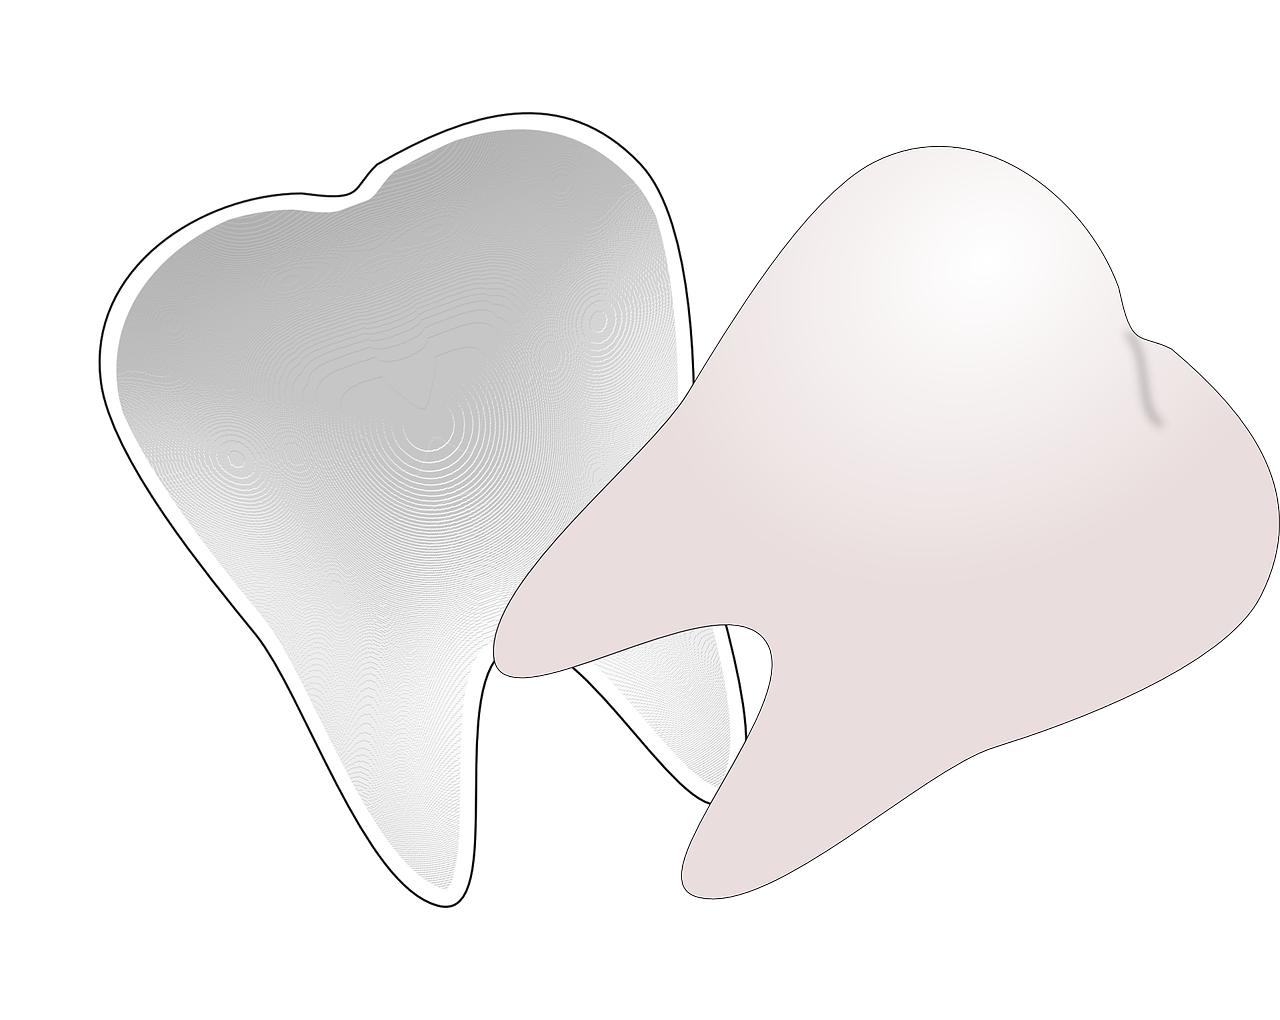 Dentist clipart dental phobia. Sedation dentistry it s